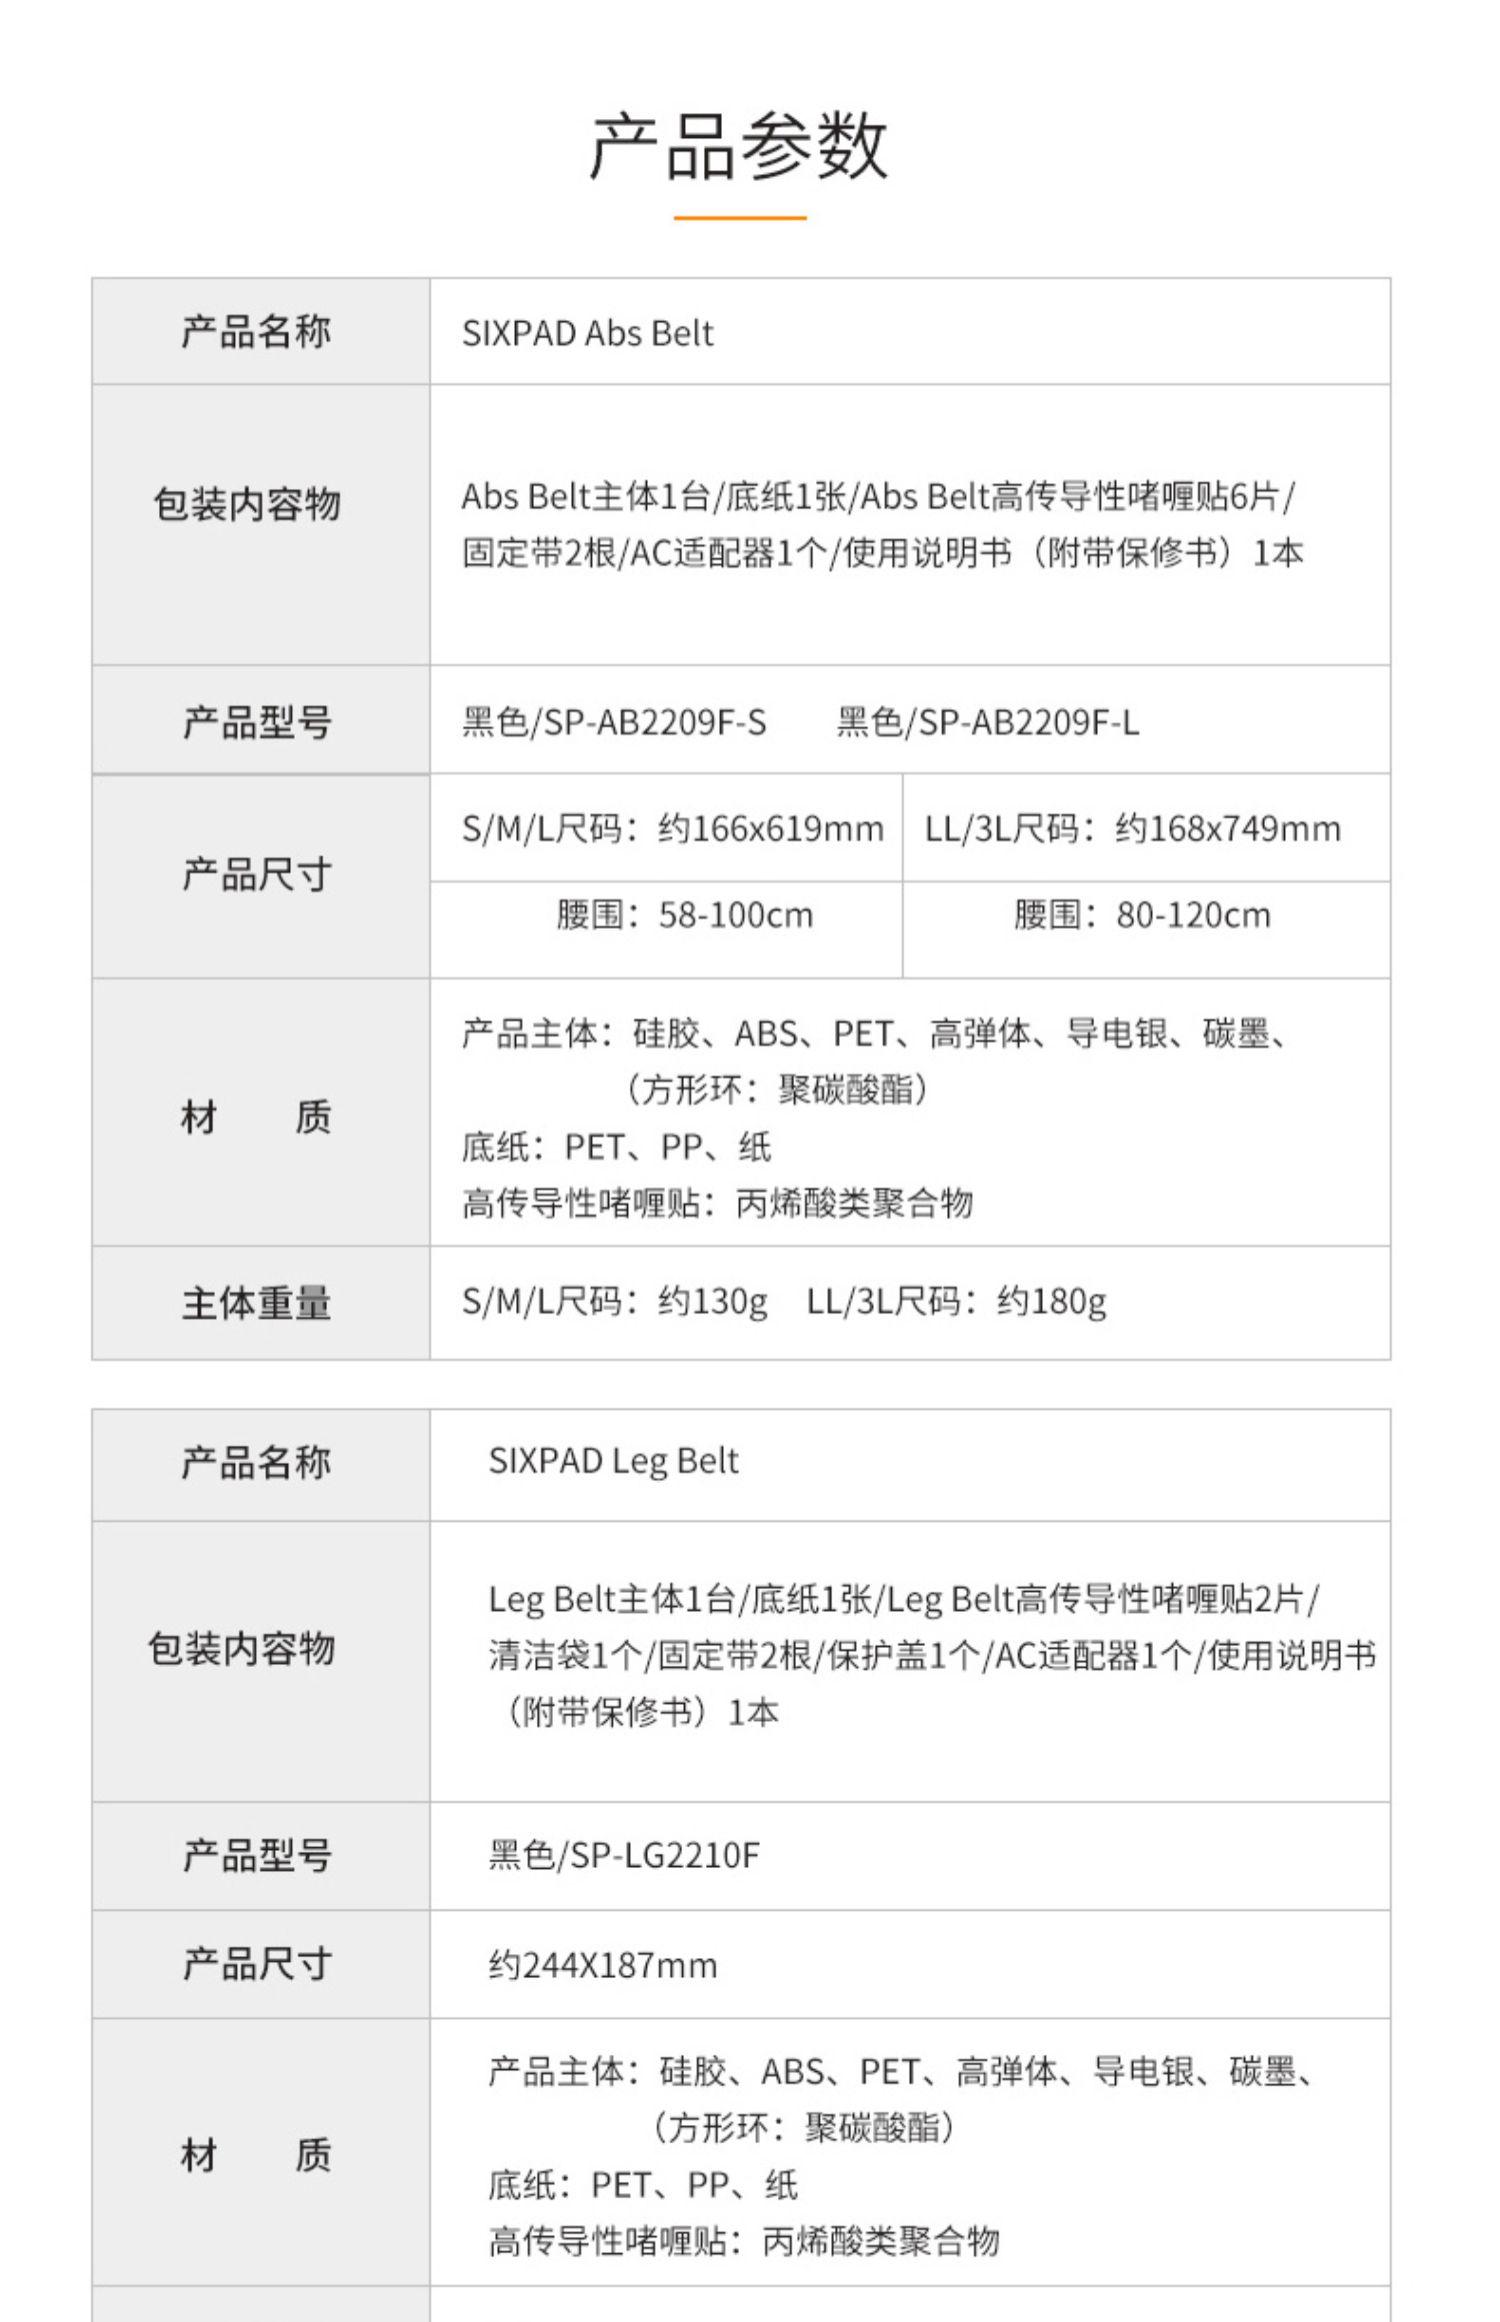 C罗SIXPAD腰腹健身仪Abs Belt&Twin Leg Set腰腹腿部锻炼增肌塑形商品详情图